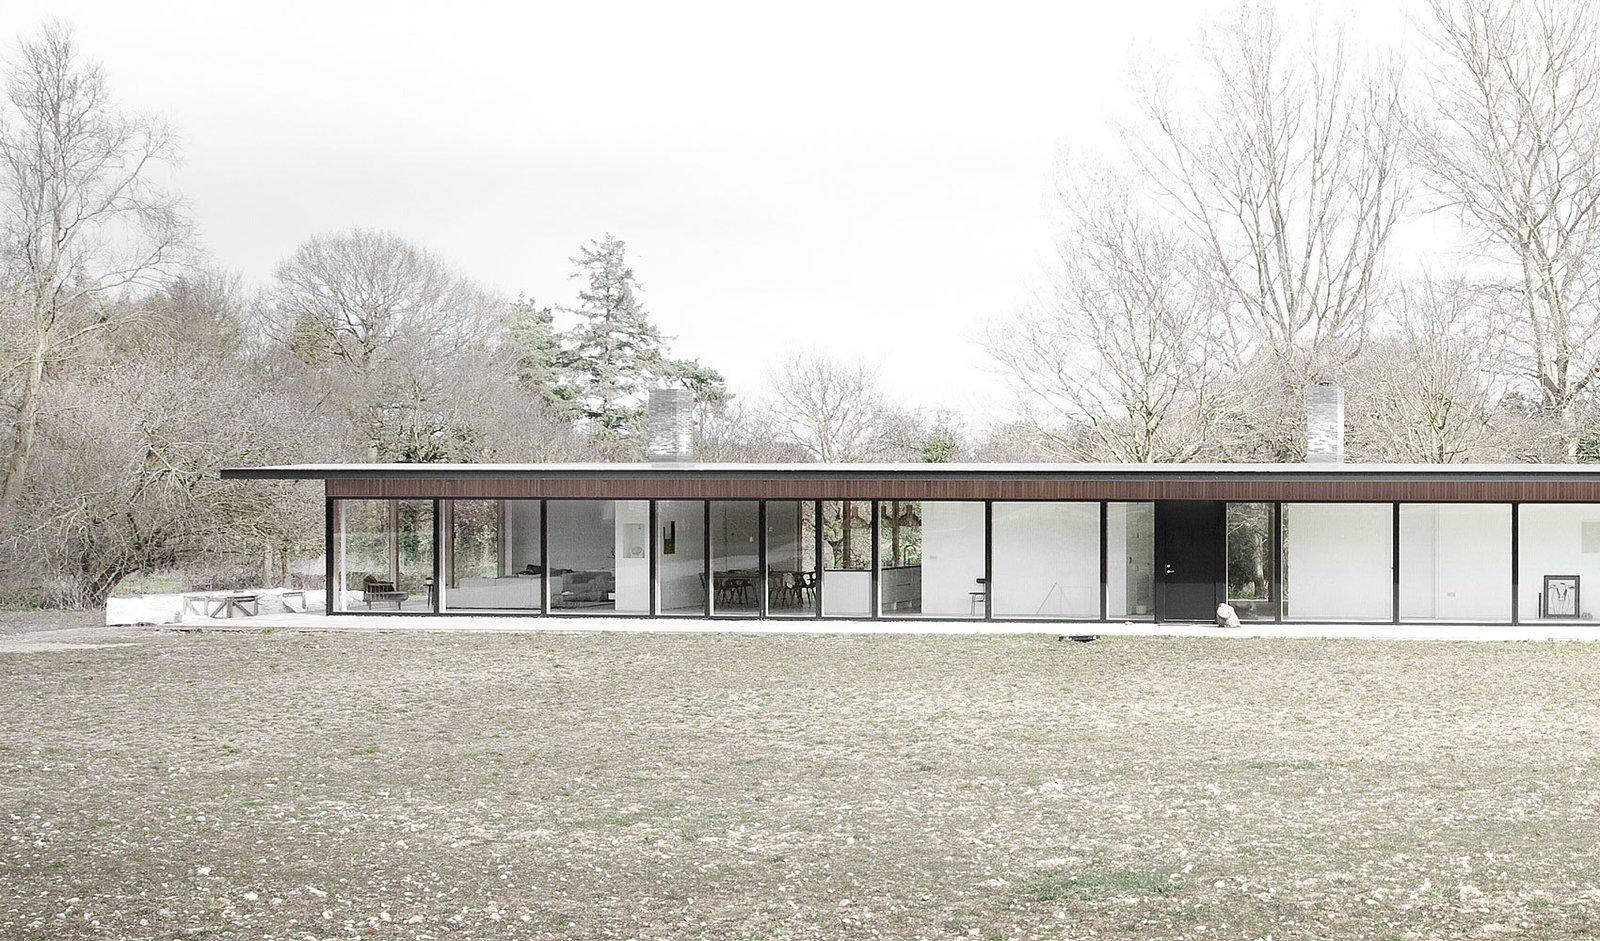 Photo 1 of 12 in Spotlight on Multidisciplinary Danish Design Studio, Norm Architects